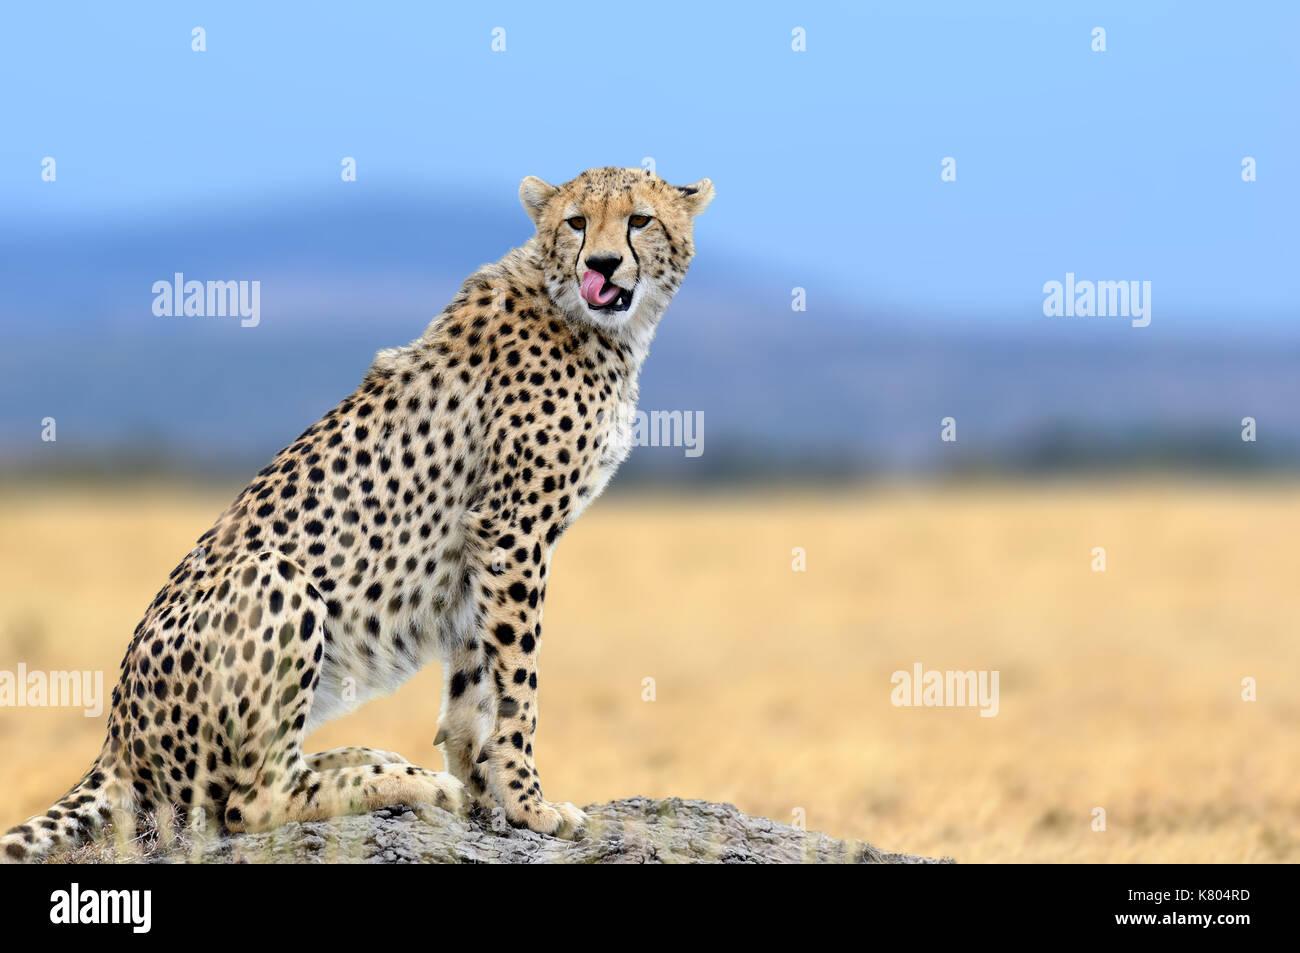 African cheetah, Masai Mara National Park, Kenya, Africa. Cat in nature habitat. Greeting of cats - Stock Image